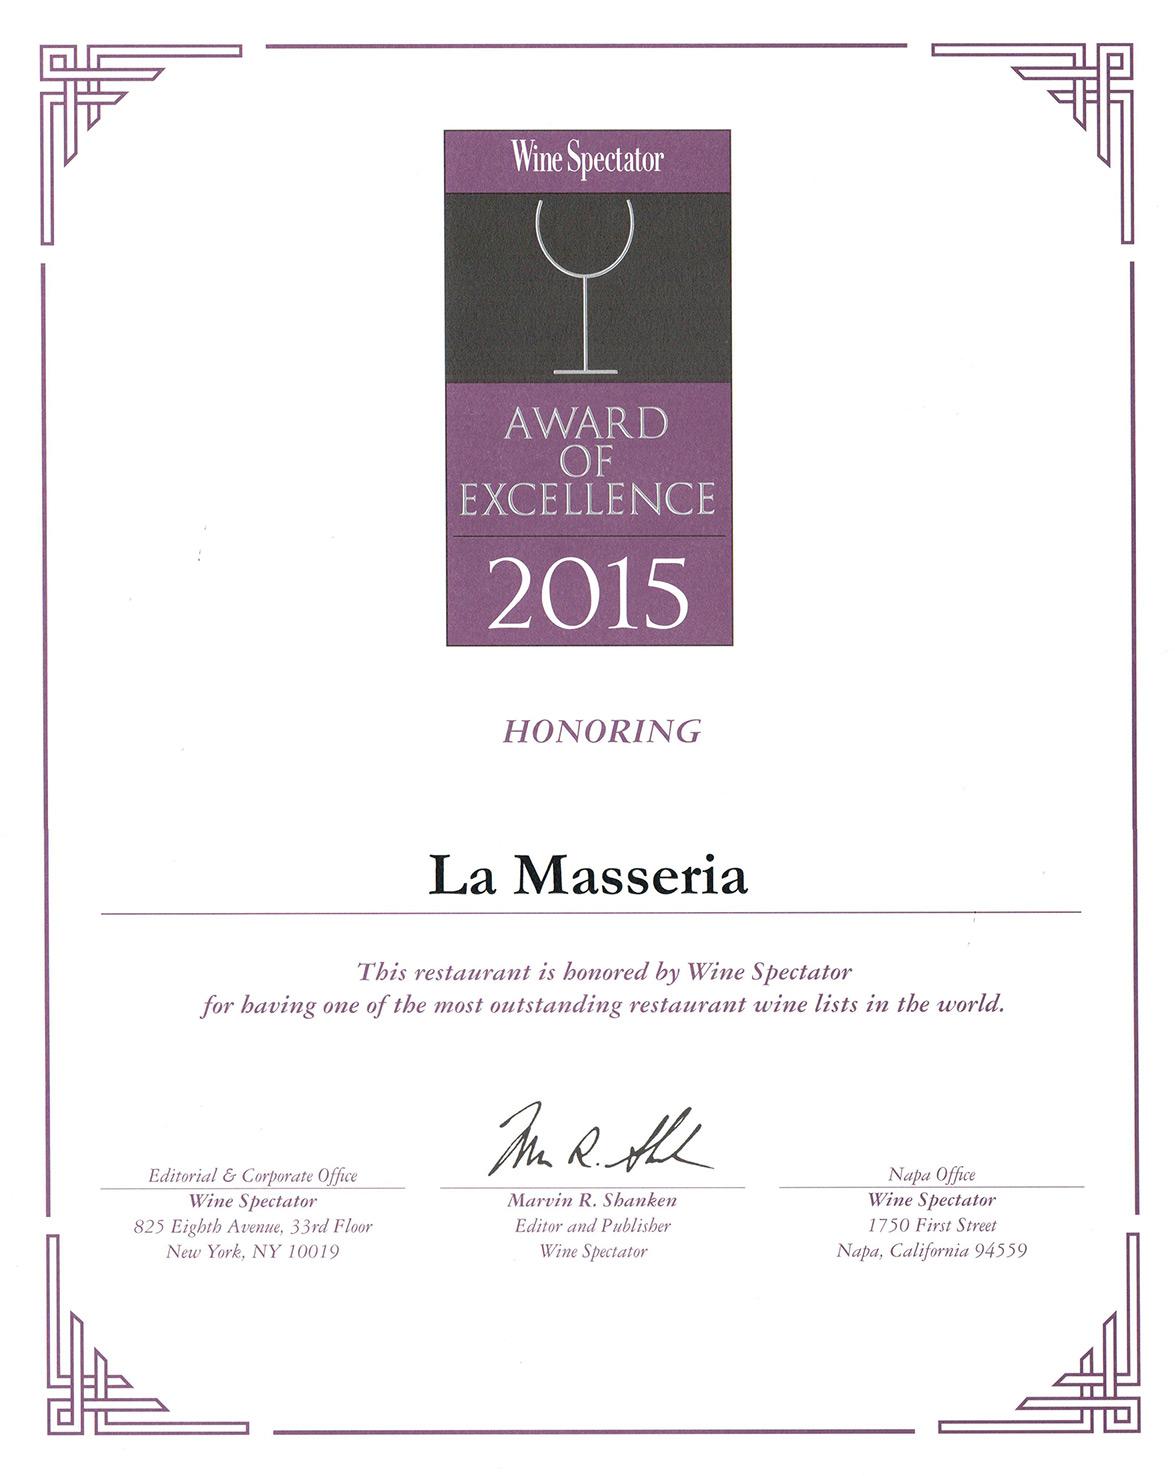 Wine Spectator Award 2015 for La Masseria New York City